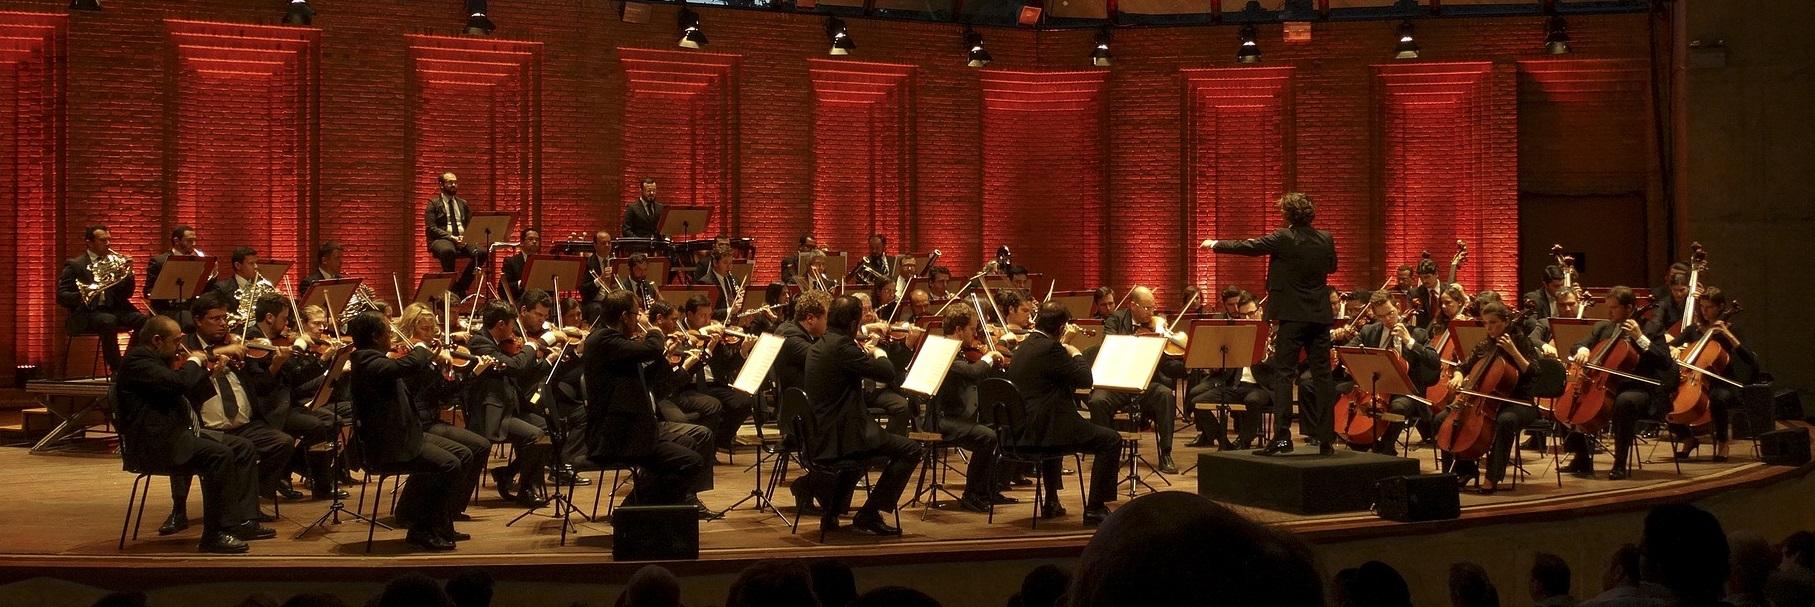 orkester laval